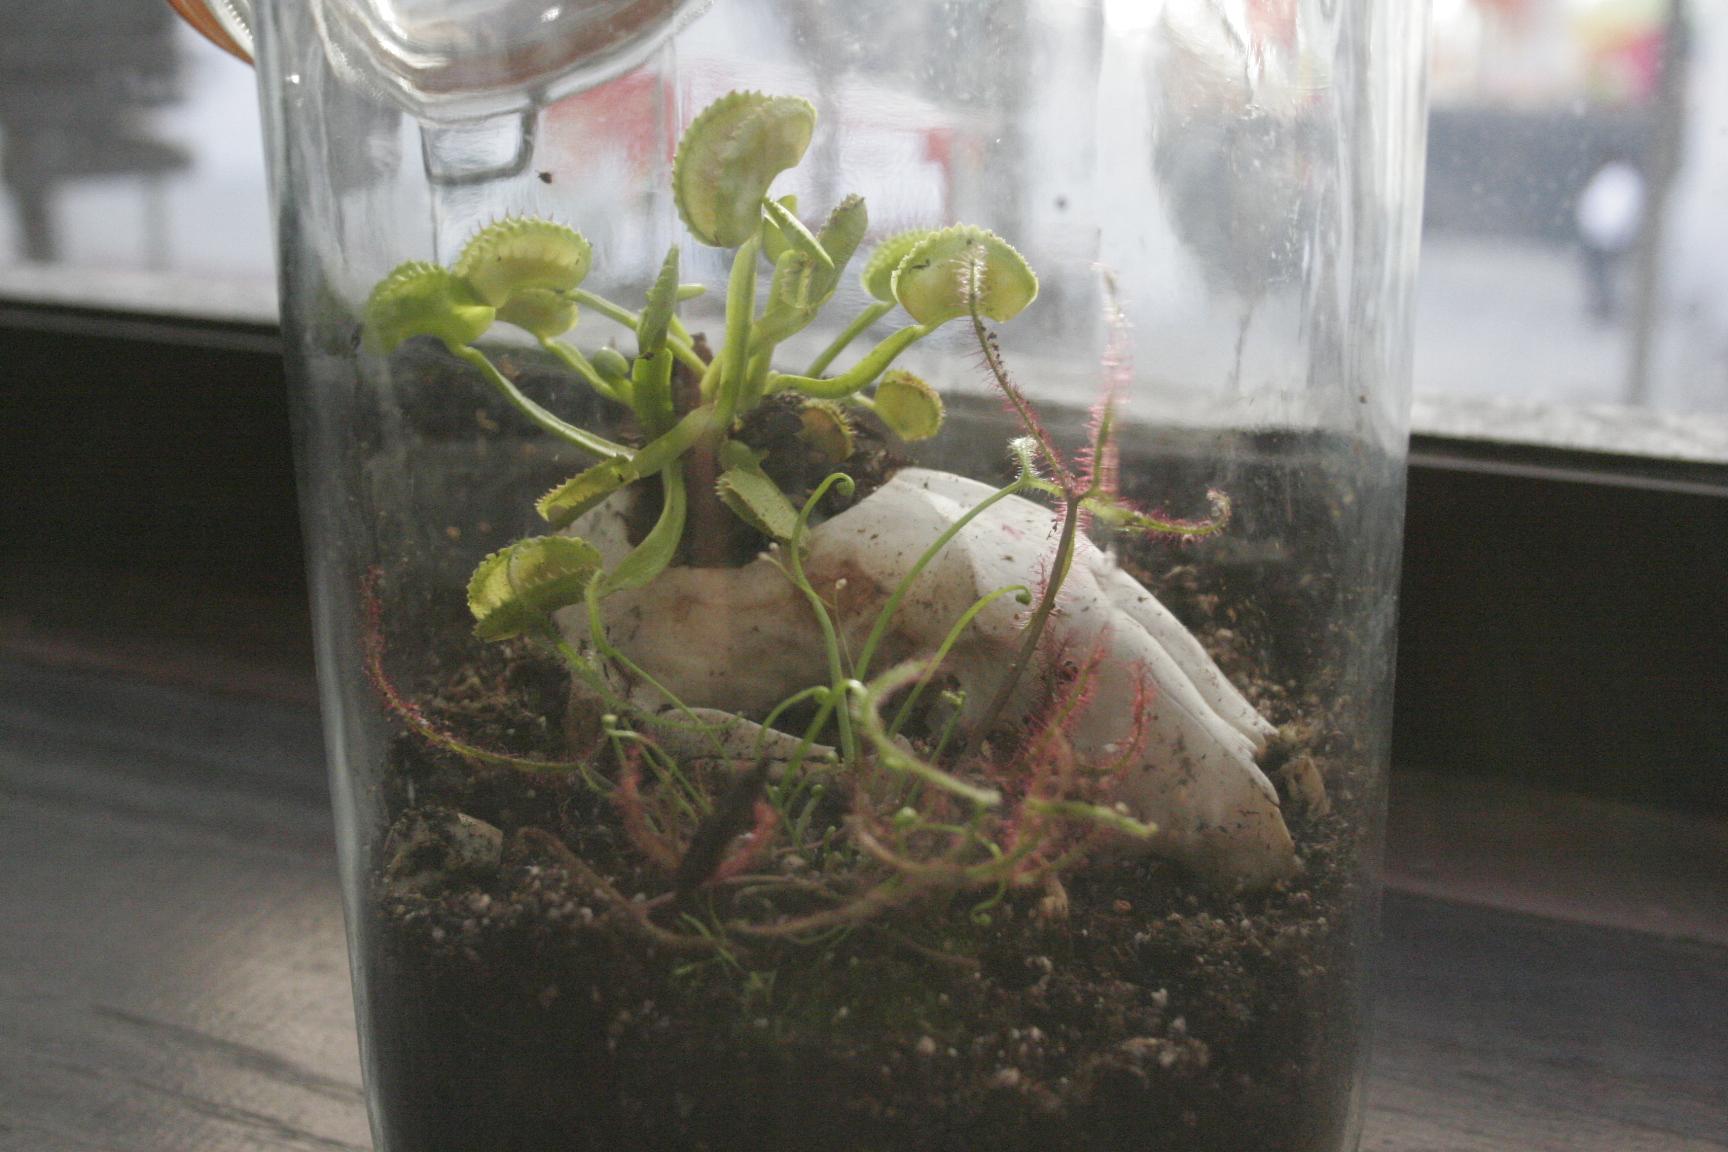 Potting soil for carnivorous plants